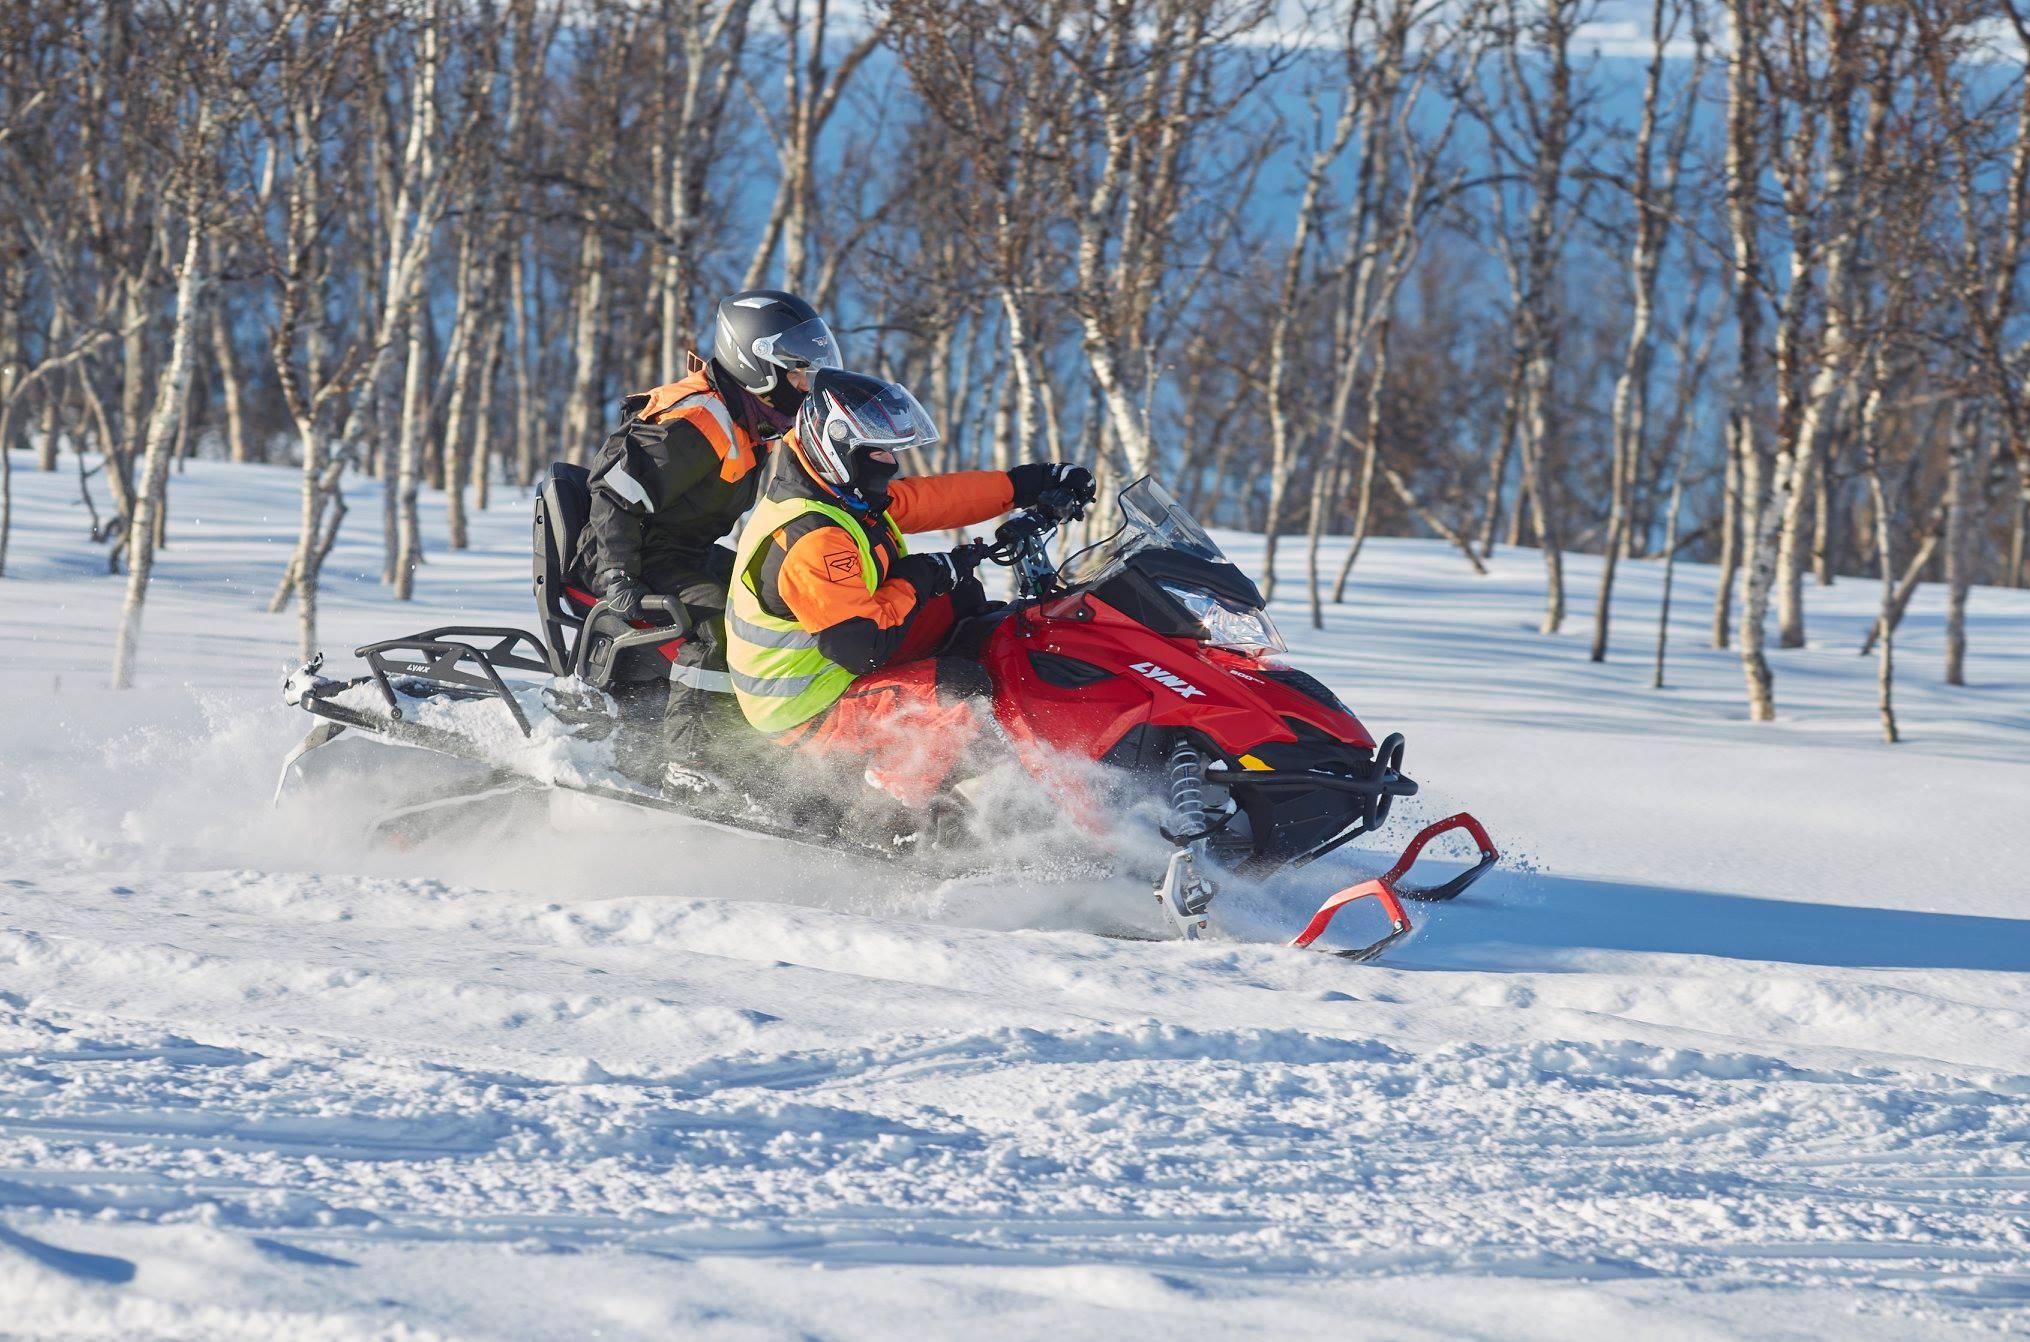 Snowmobile Arctic Cruise In Norway 8.jpg